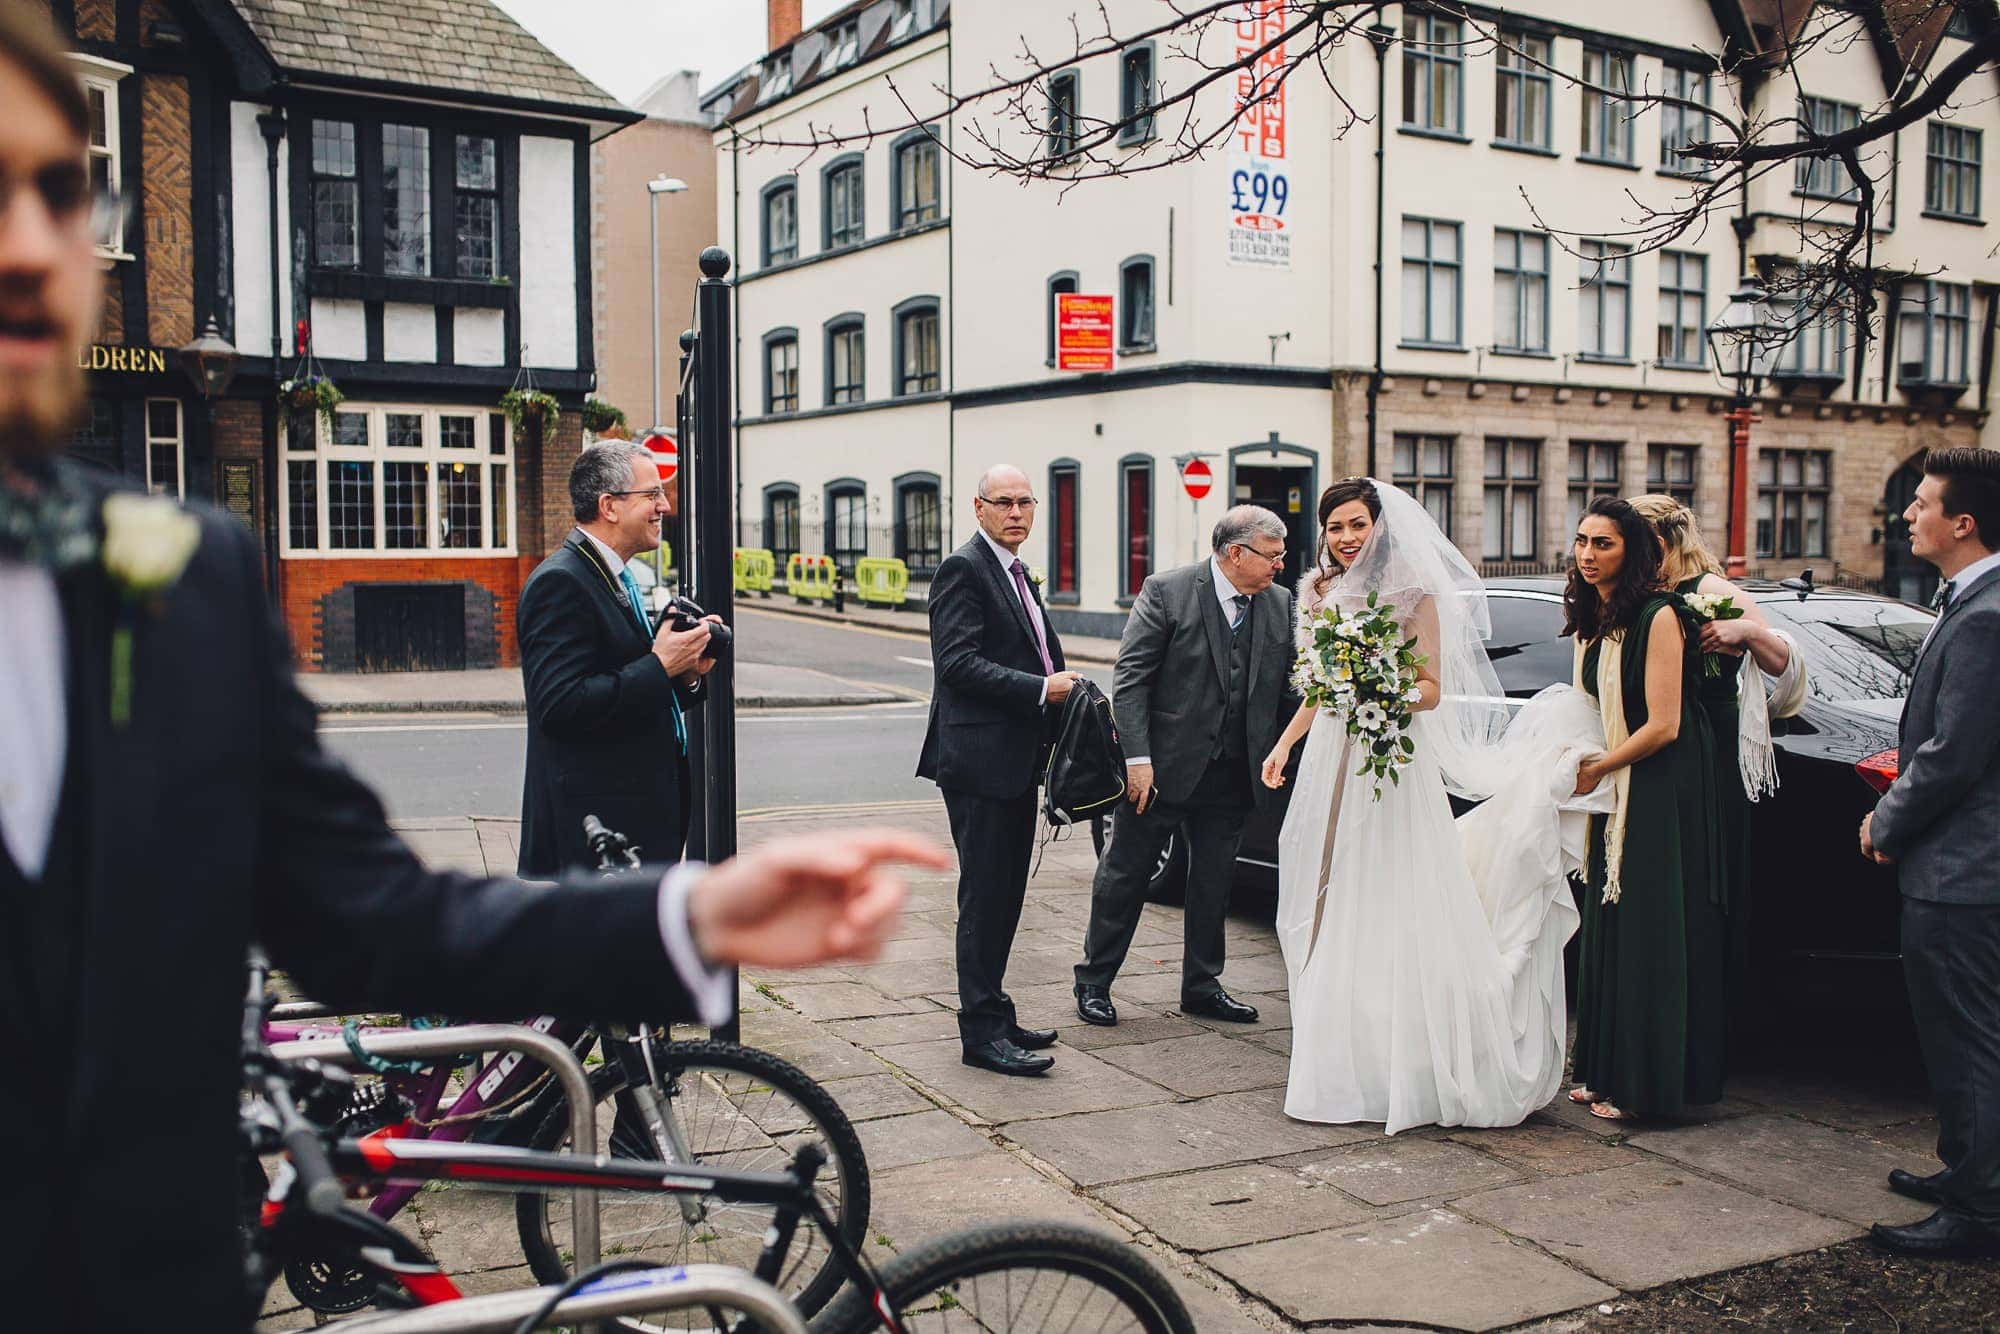 Matlt-Cross-Nottingham-wedding-Photography-21